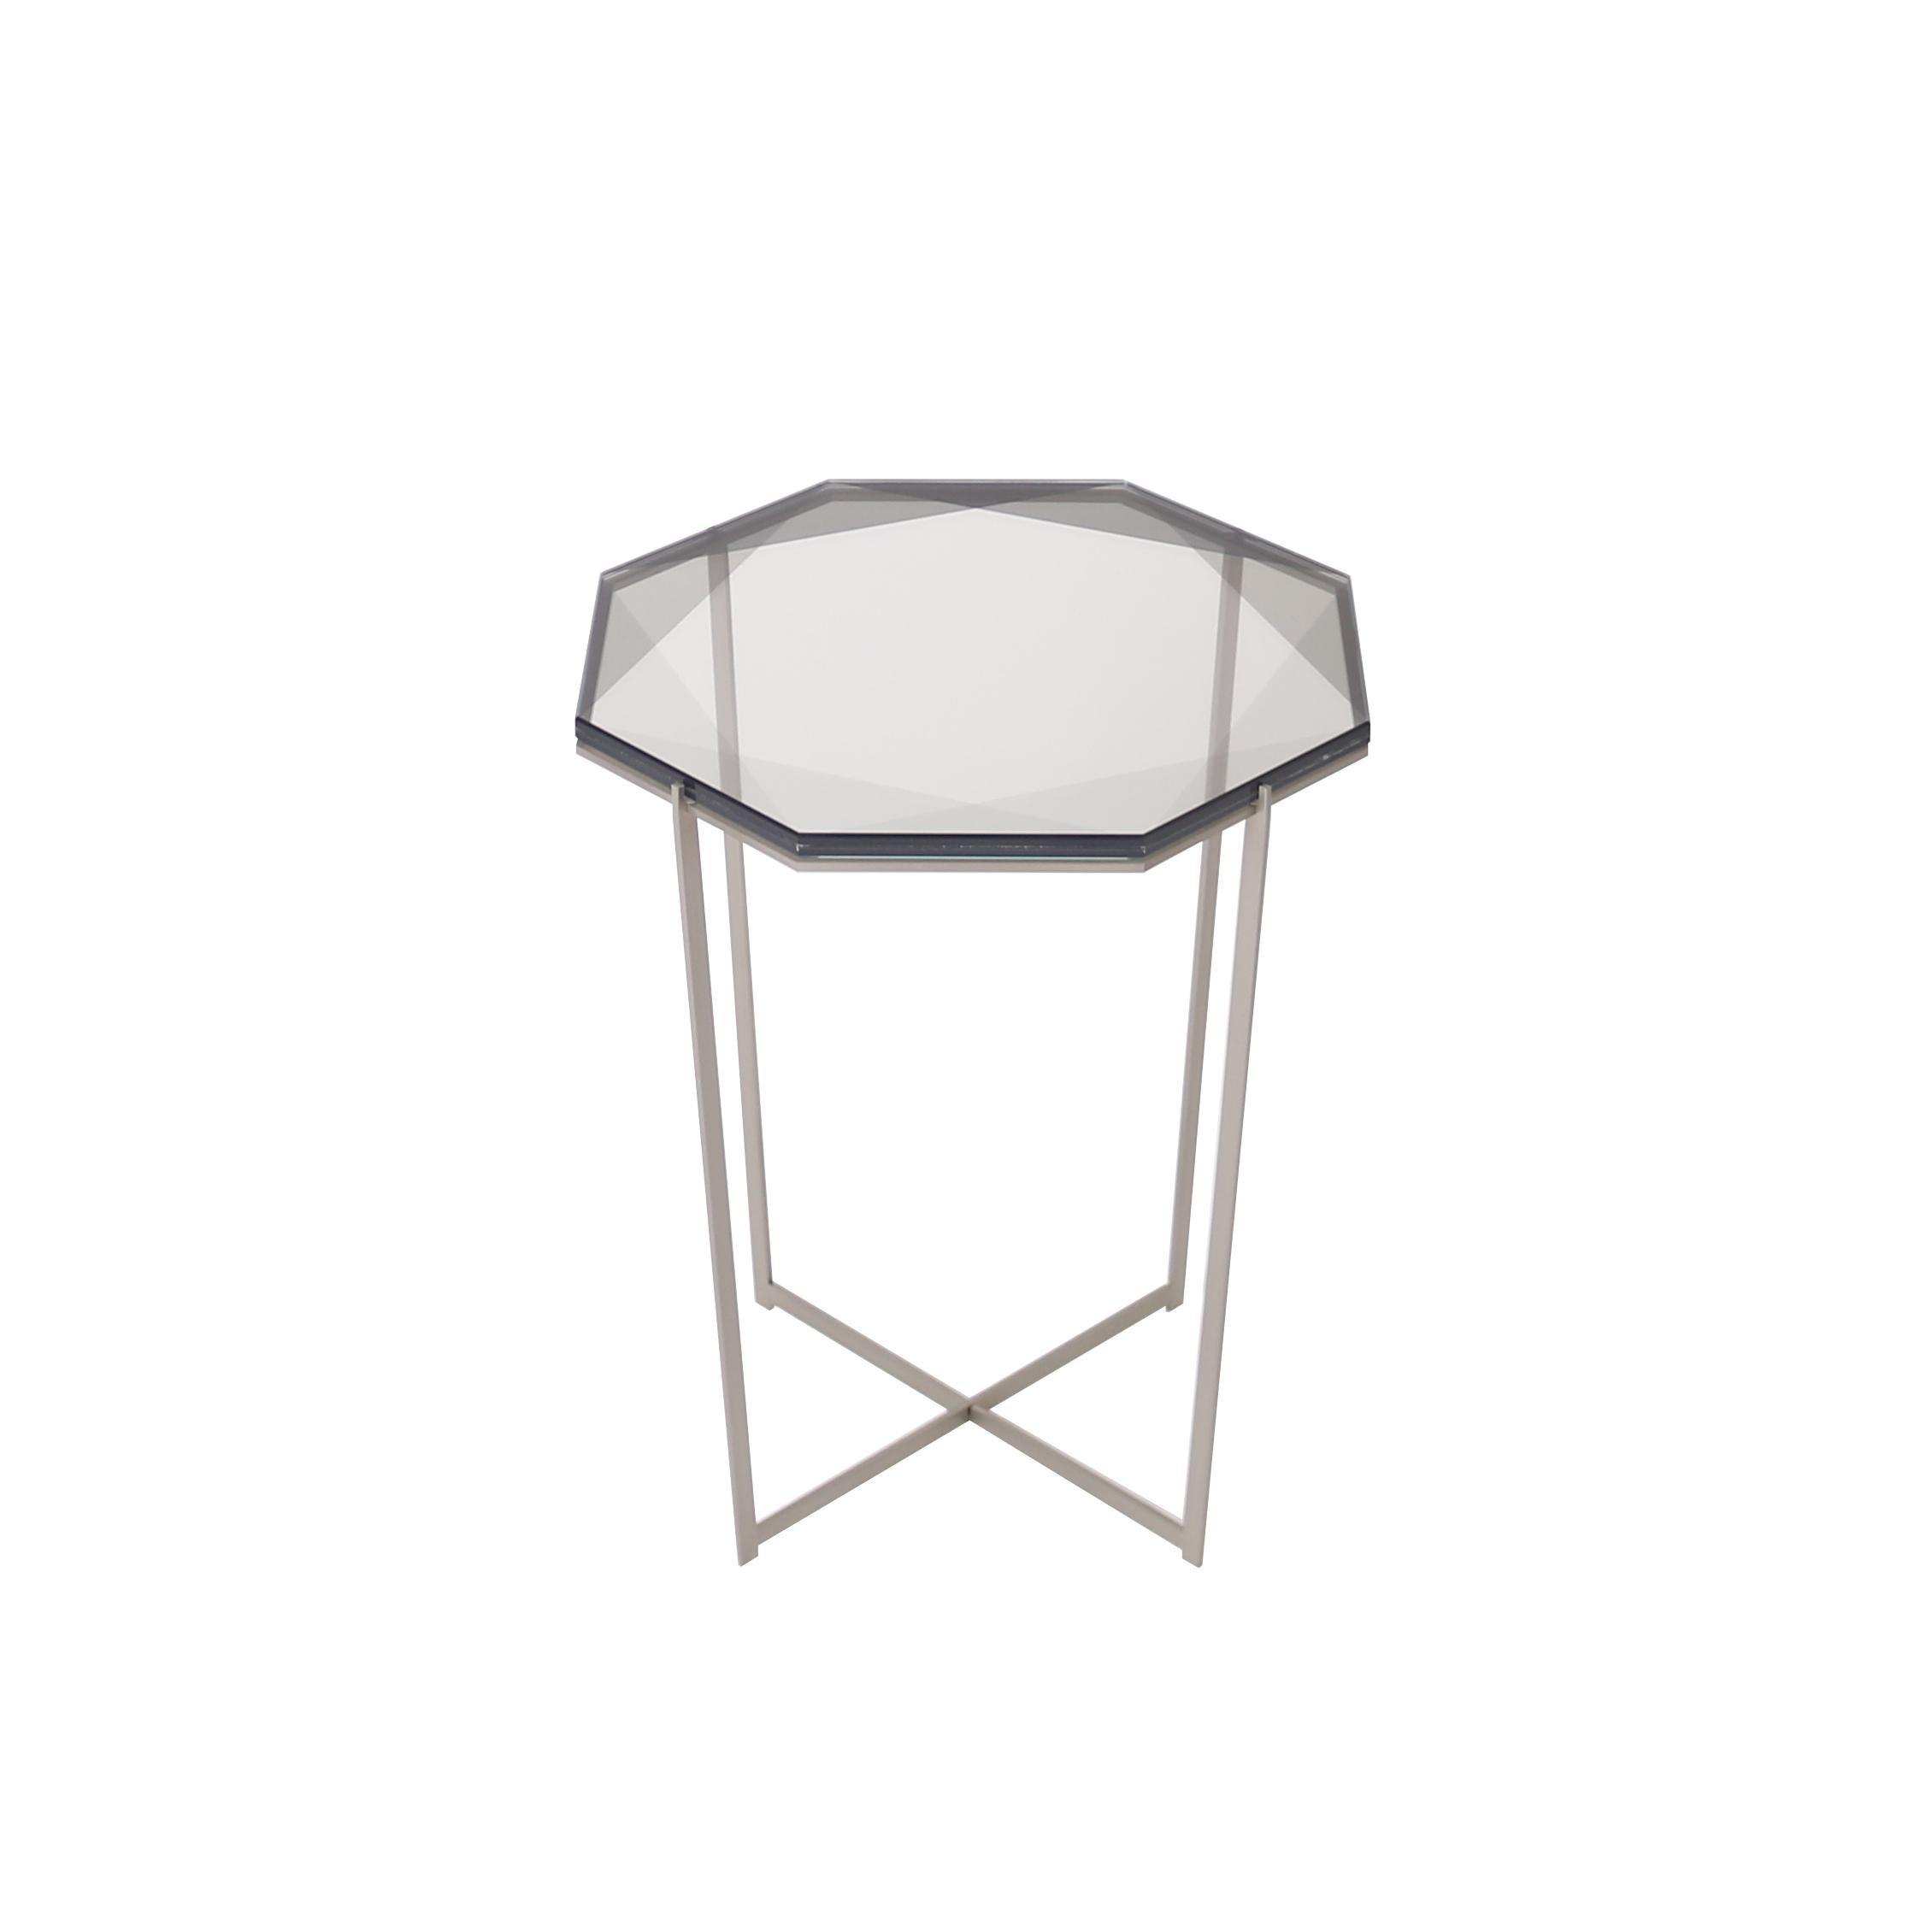 Gem Side Table - Smoke Glass w/ Stainless Steel Base by Debra Folz